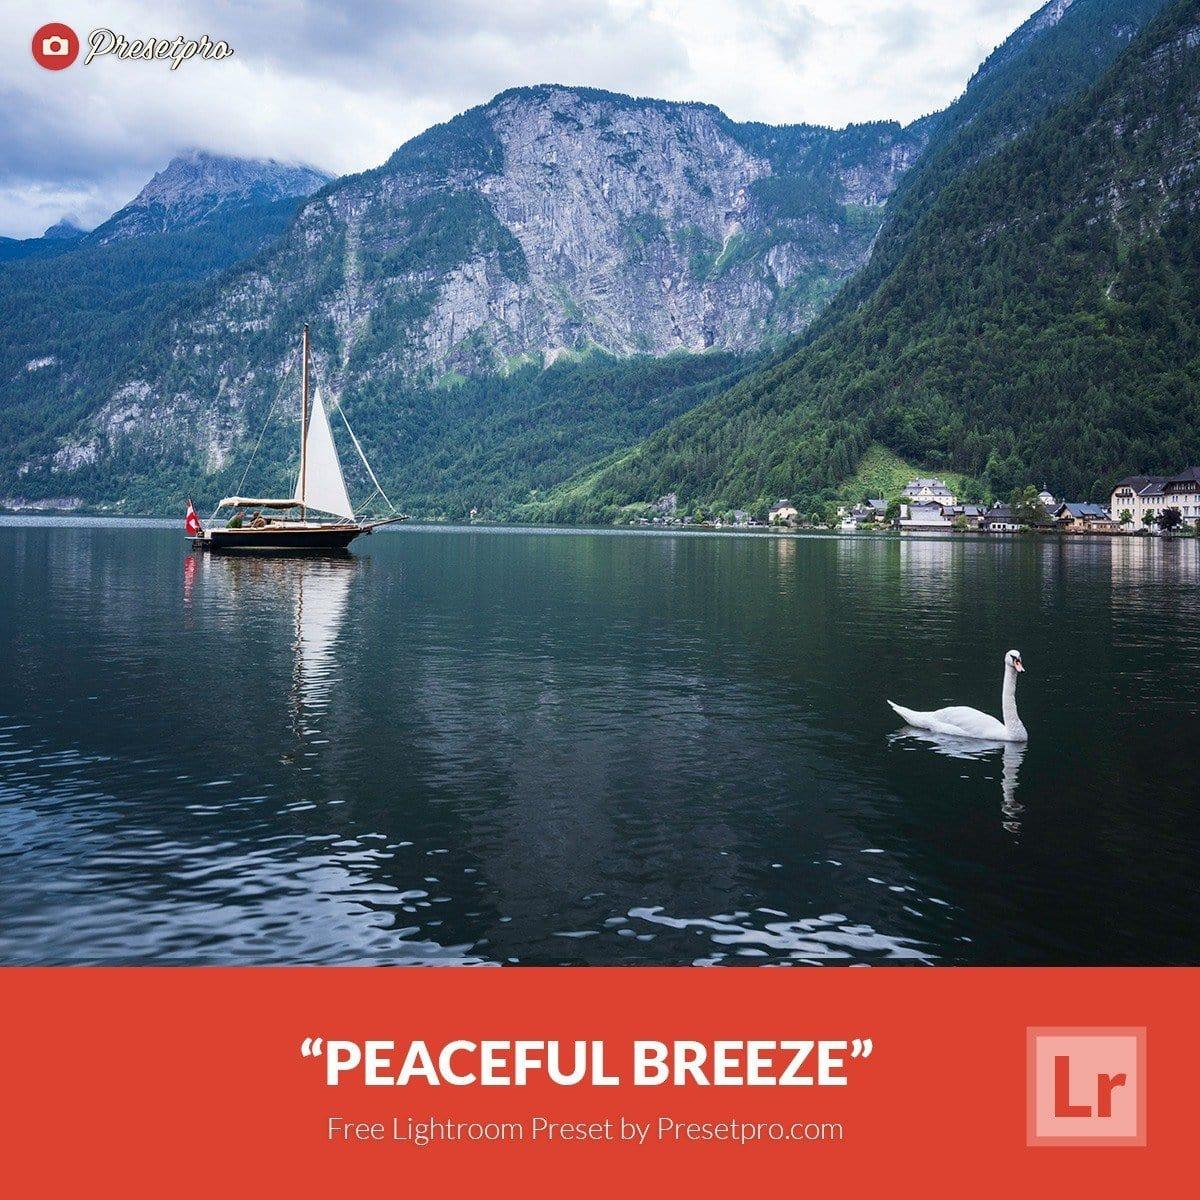 Free-Lightroom-Preset-Peaceful-Breeze-Presetpro